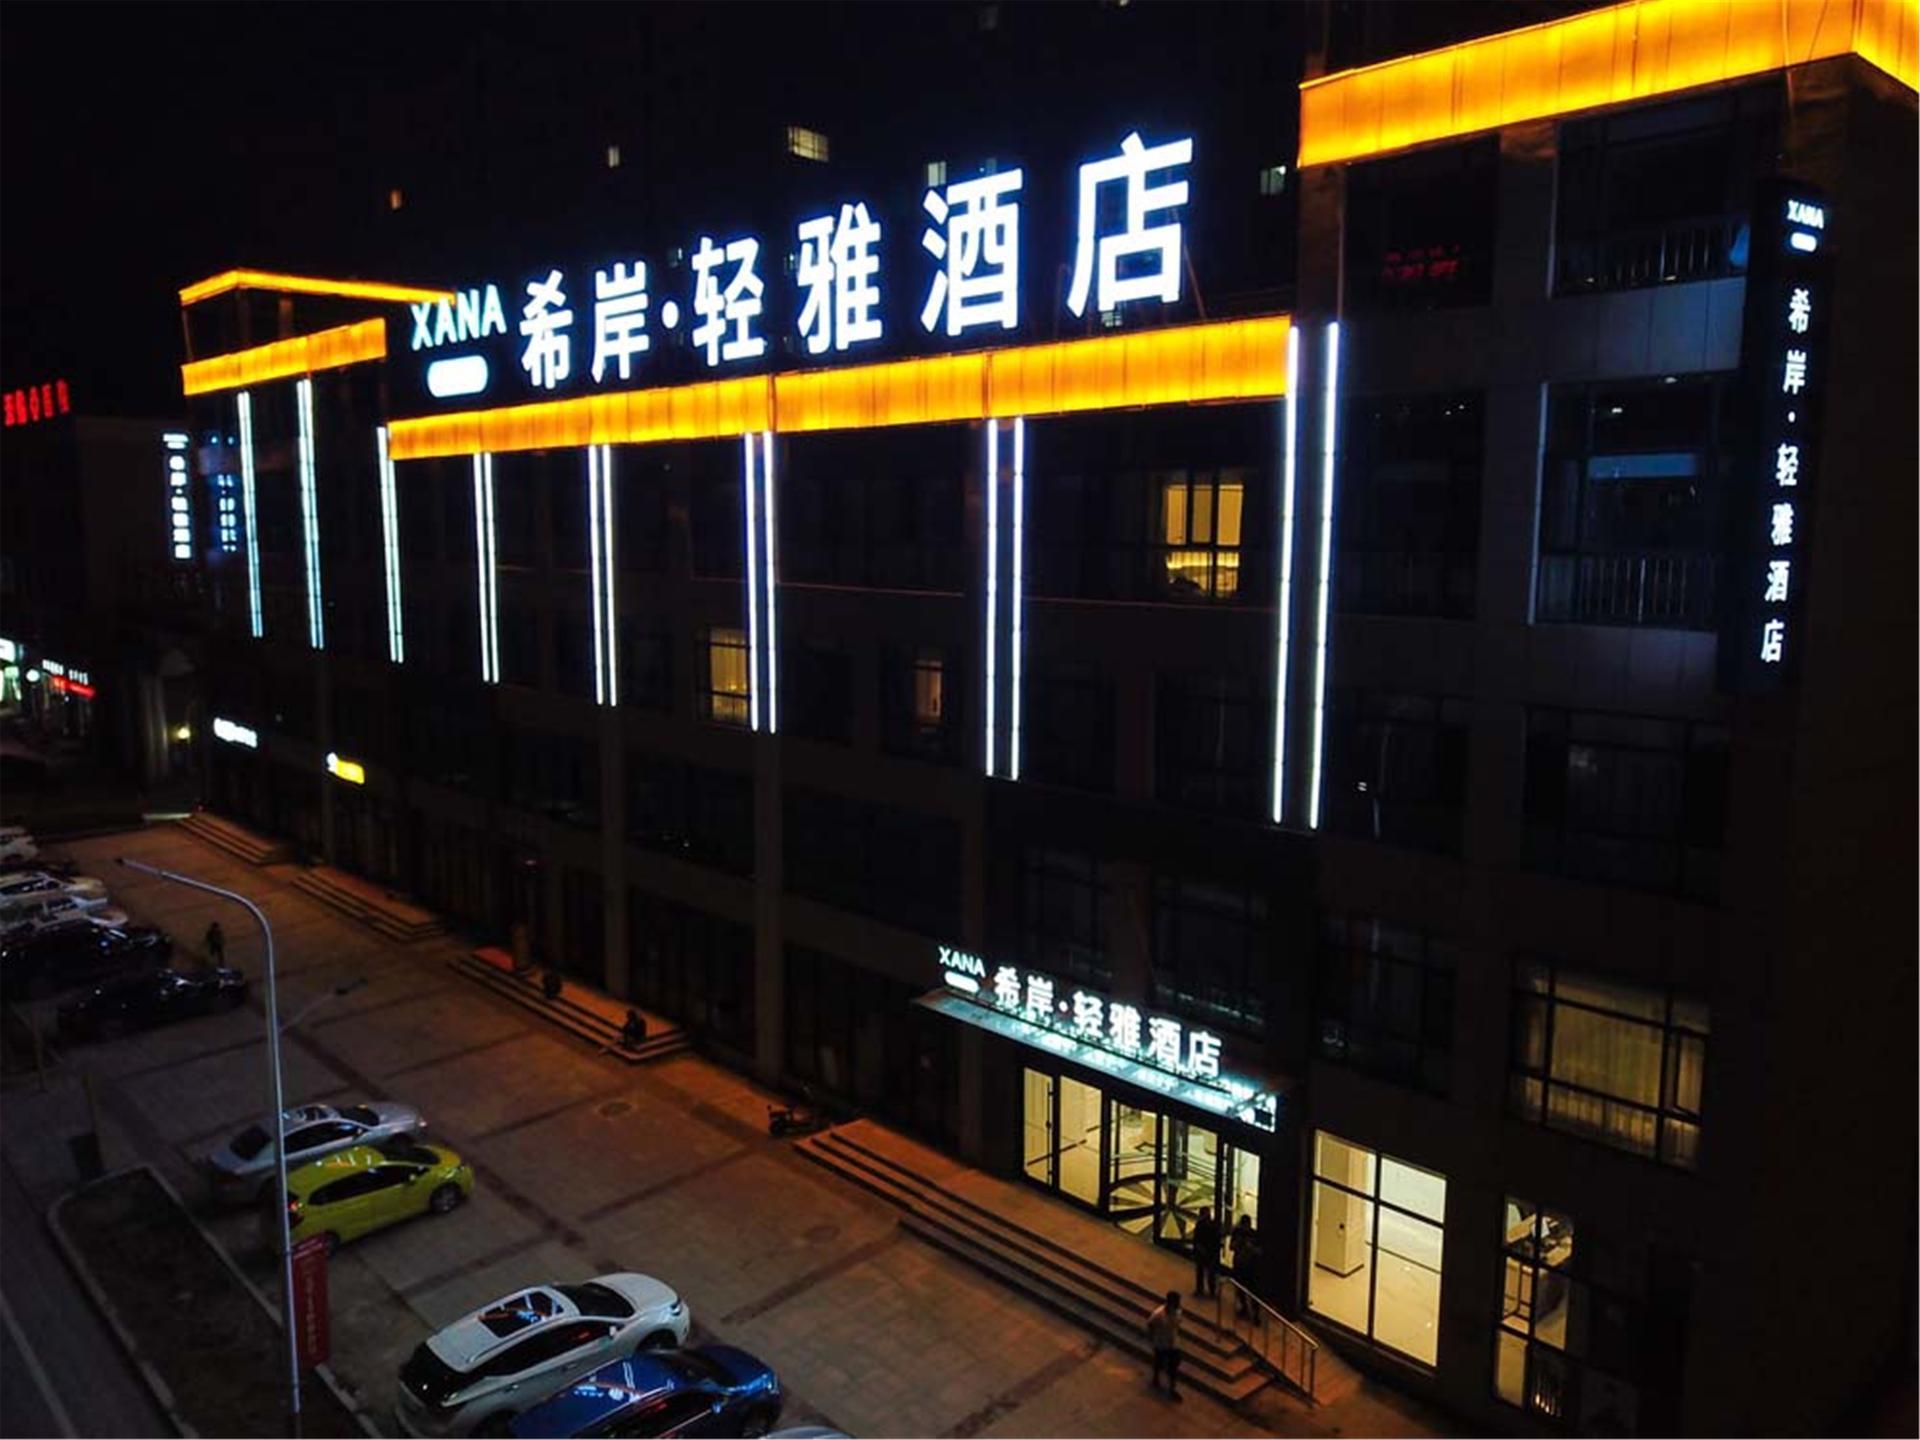 Xana Lite·Chengde Xinglong County, Chengde